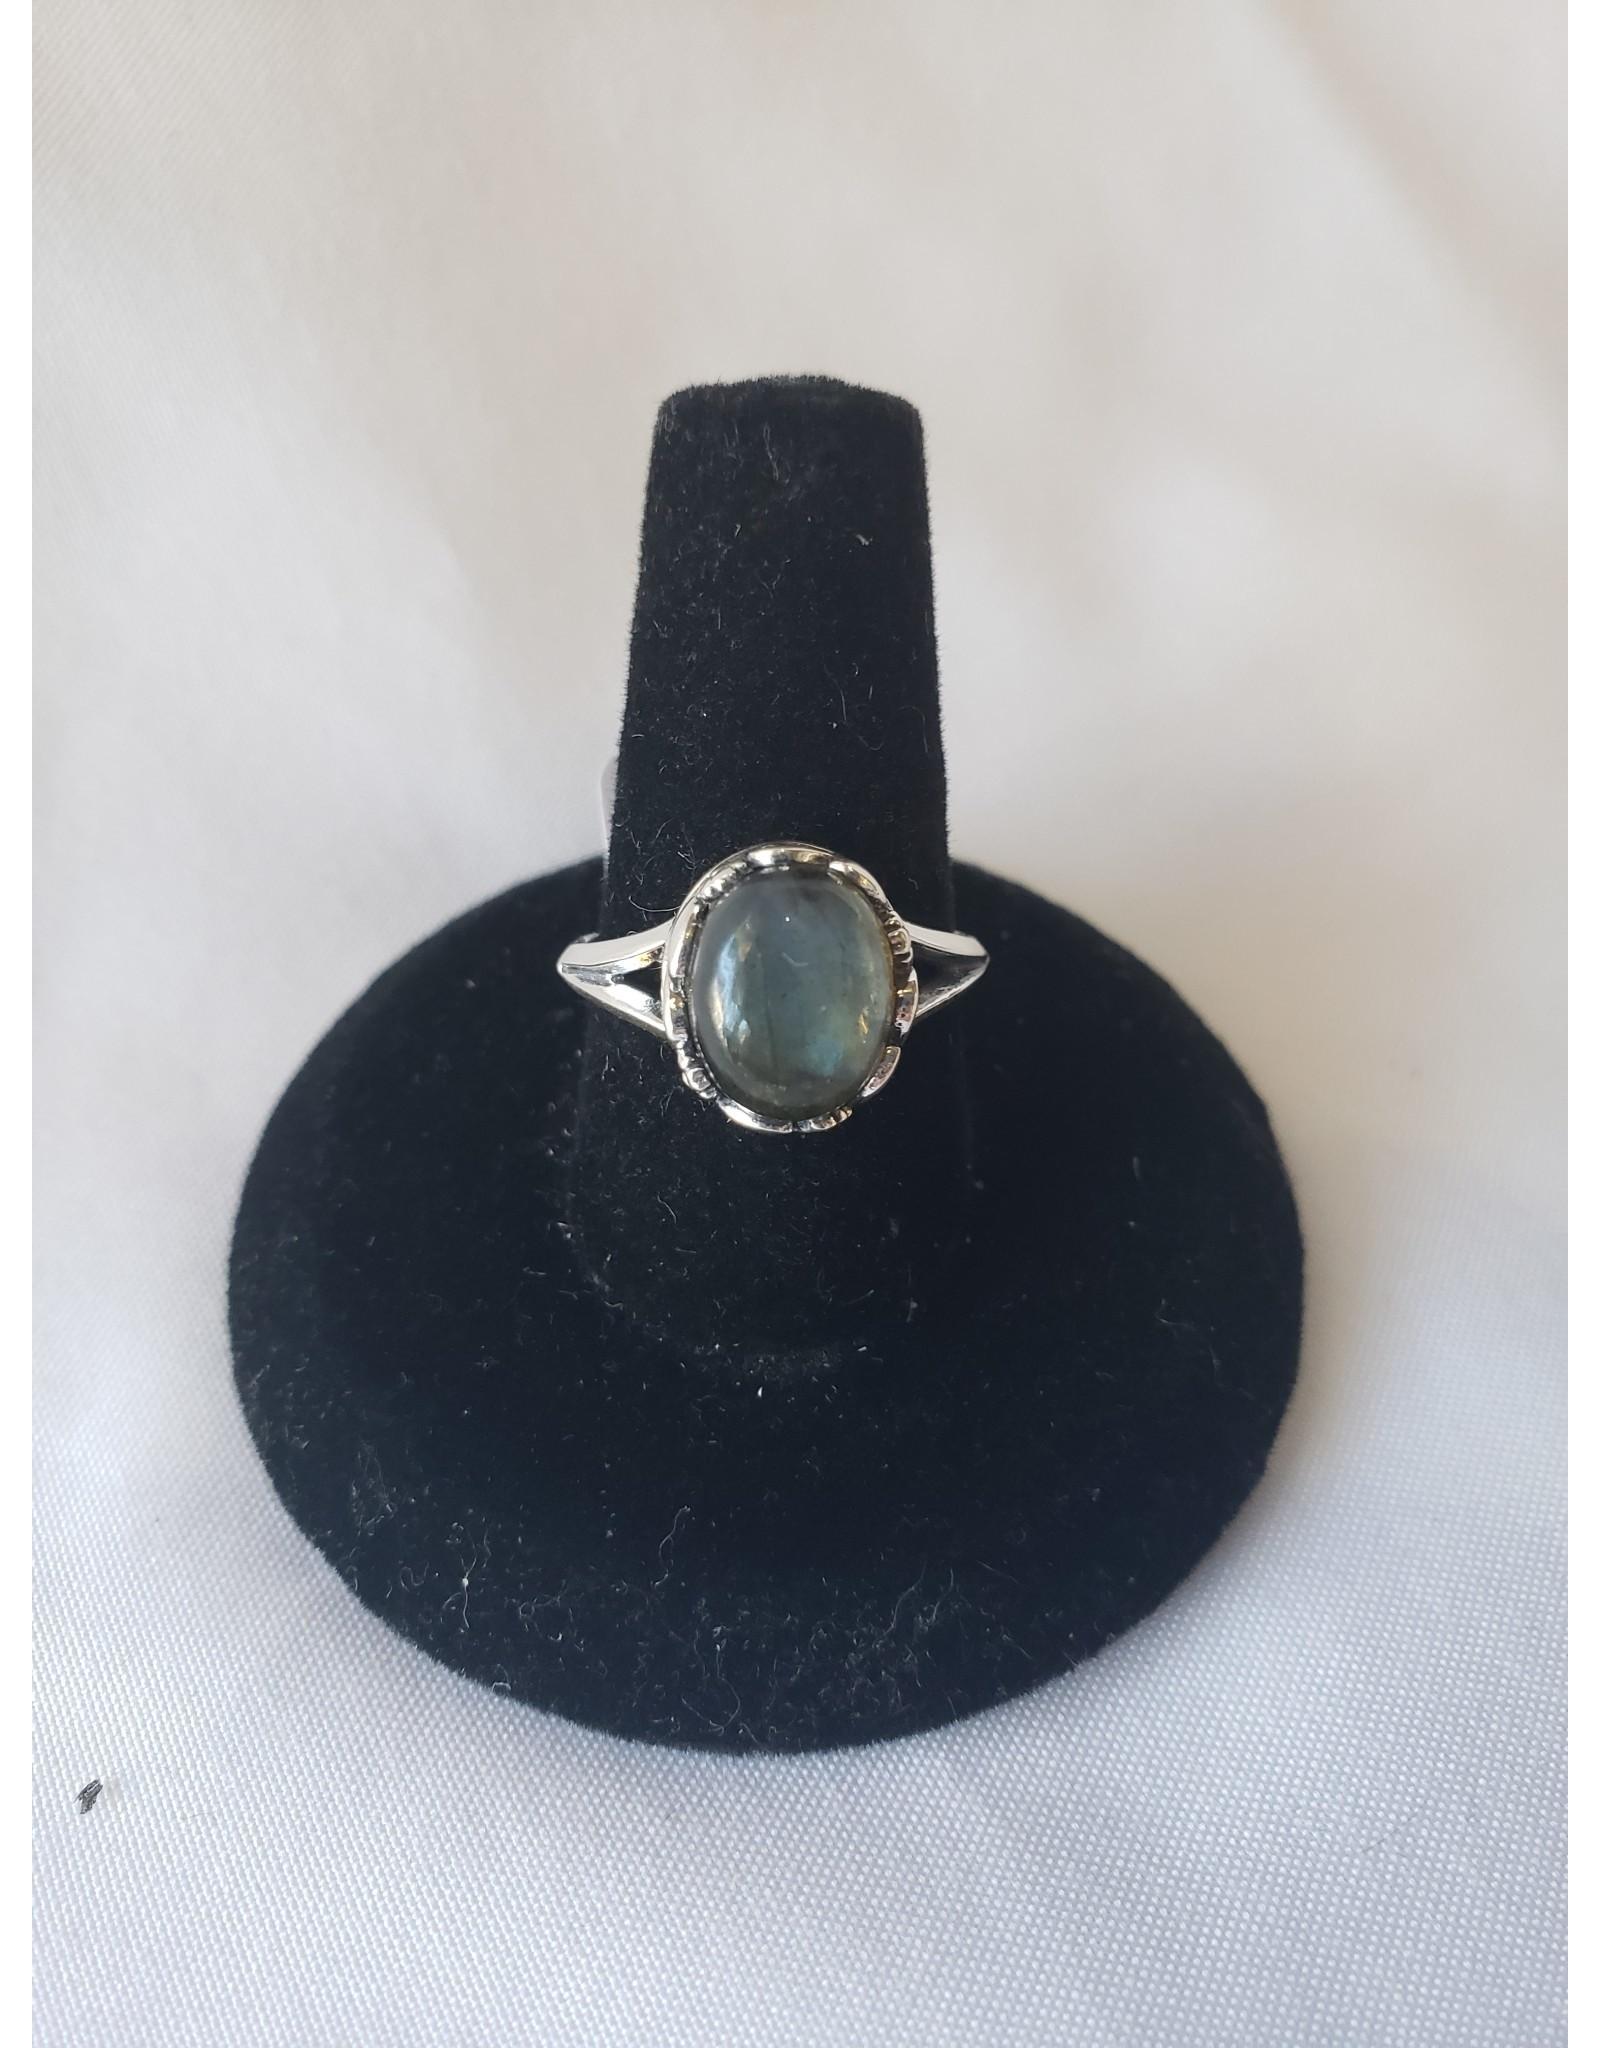 Sterling Silver - Labradorite Ring Size 6